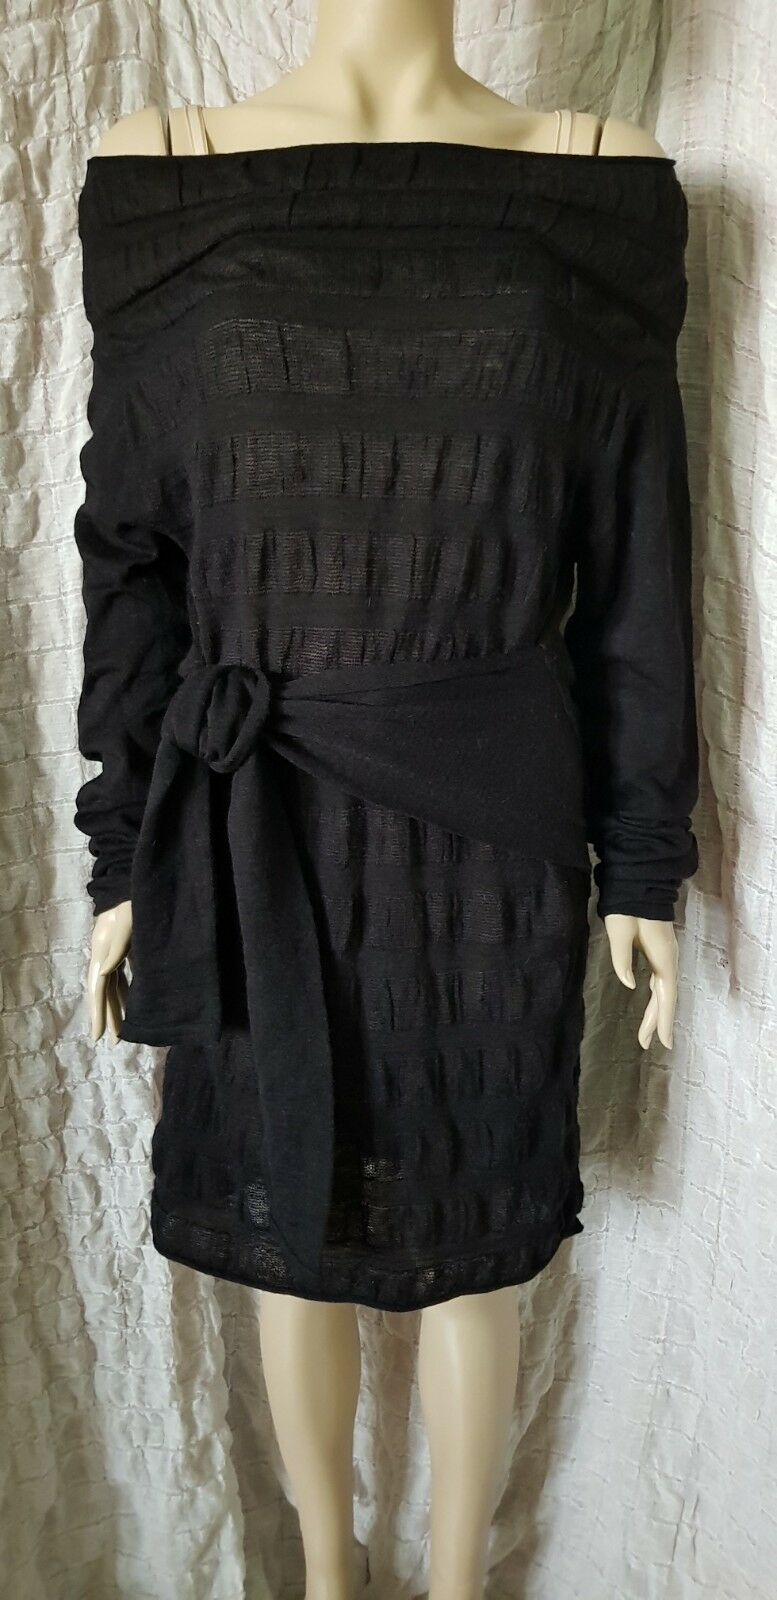 BITTE KAI RAND avantgarde schwarz knitted four sleeved funnel dress Größe L